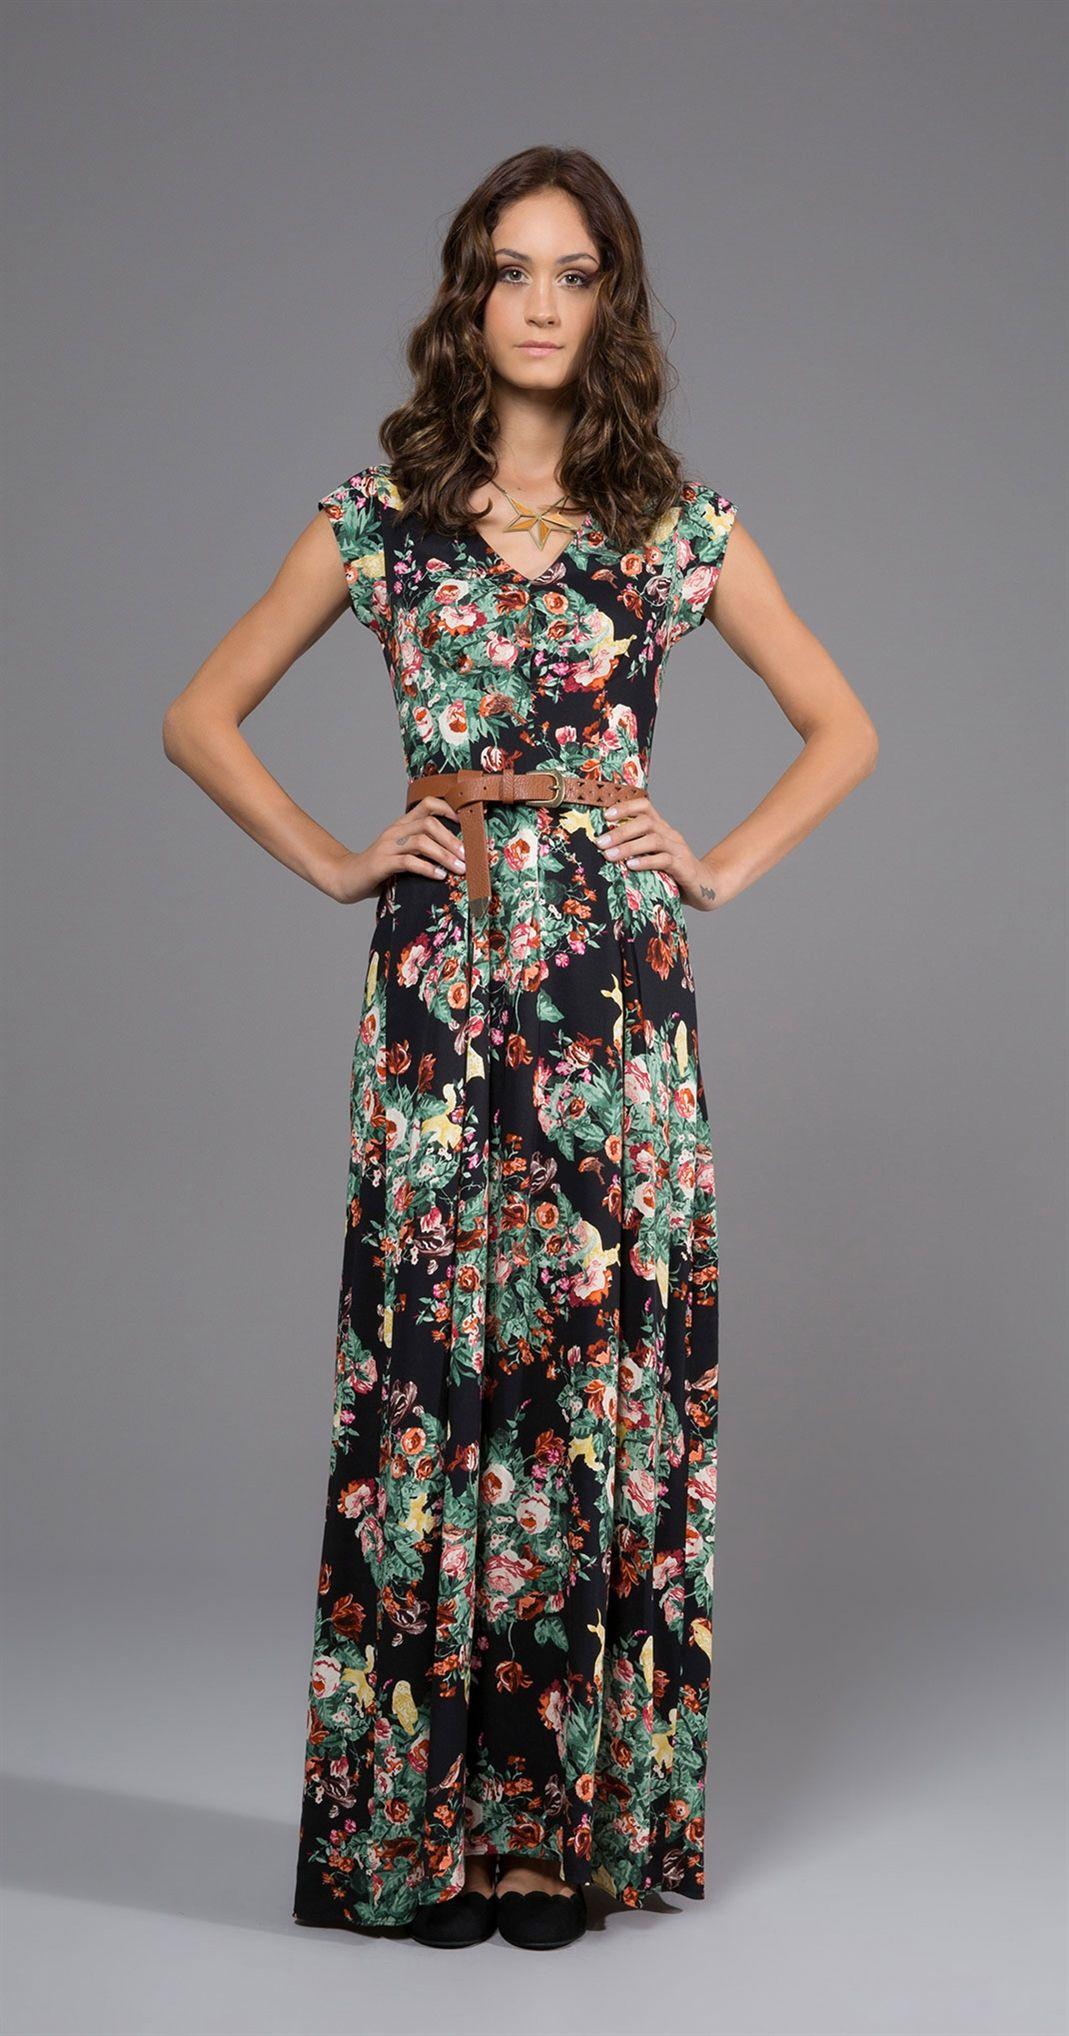 Long dress critters lookbook antix store dresses pinterest